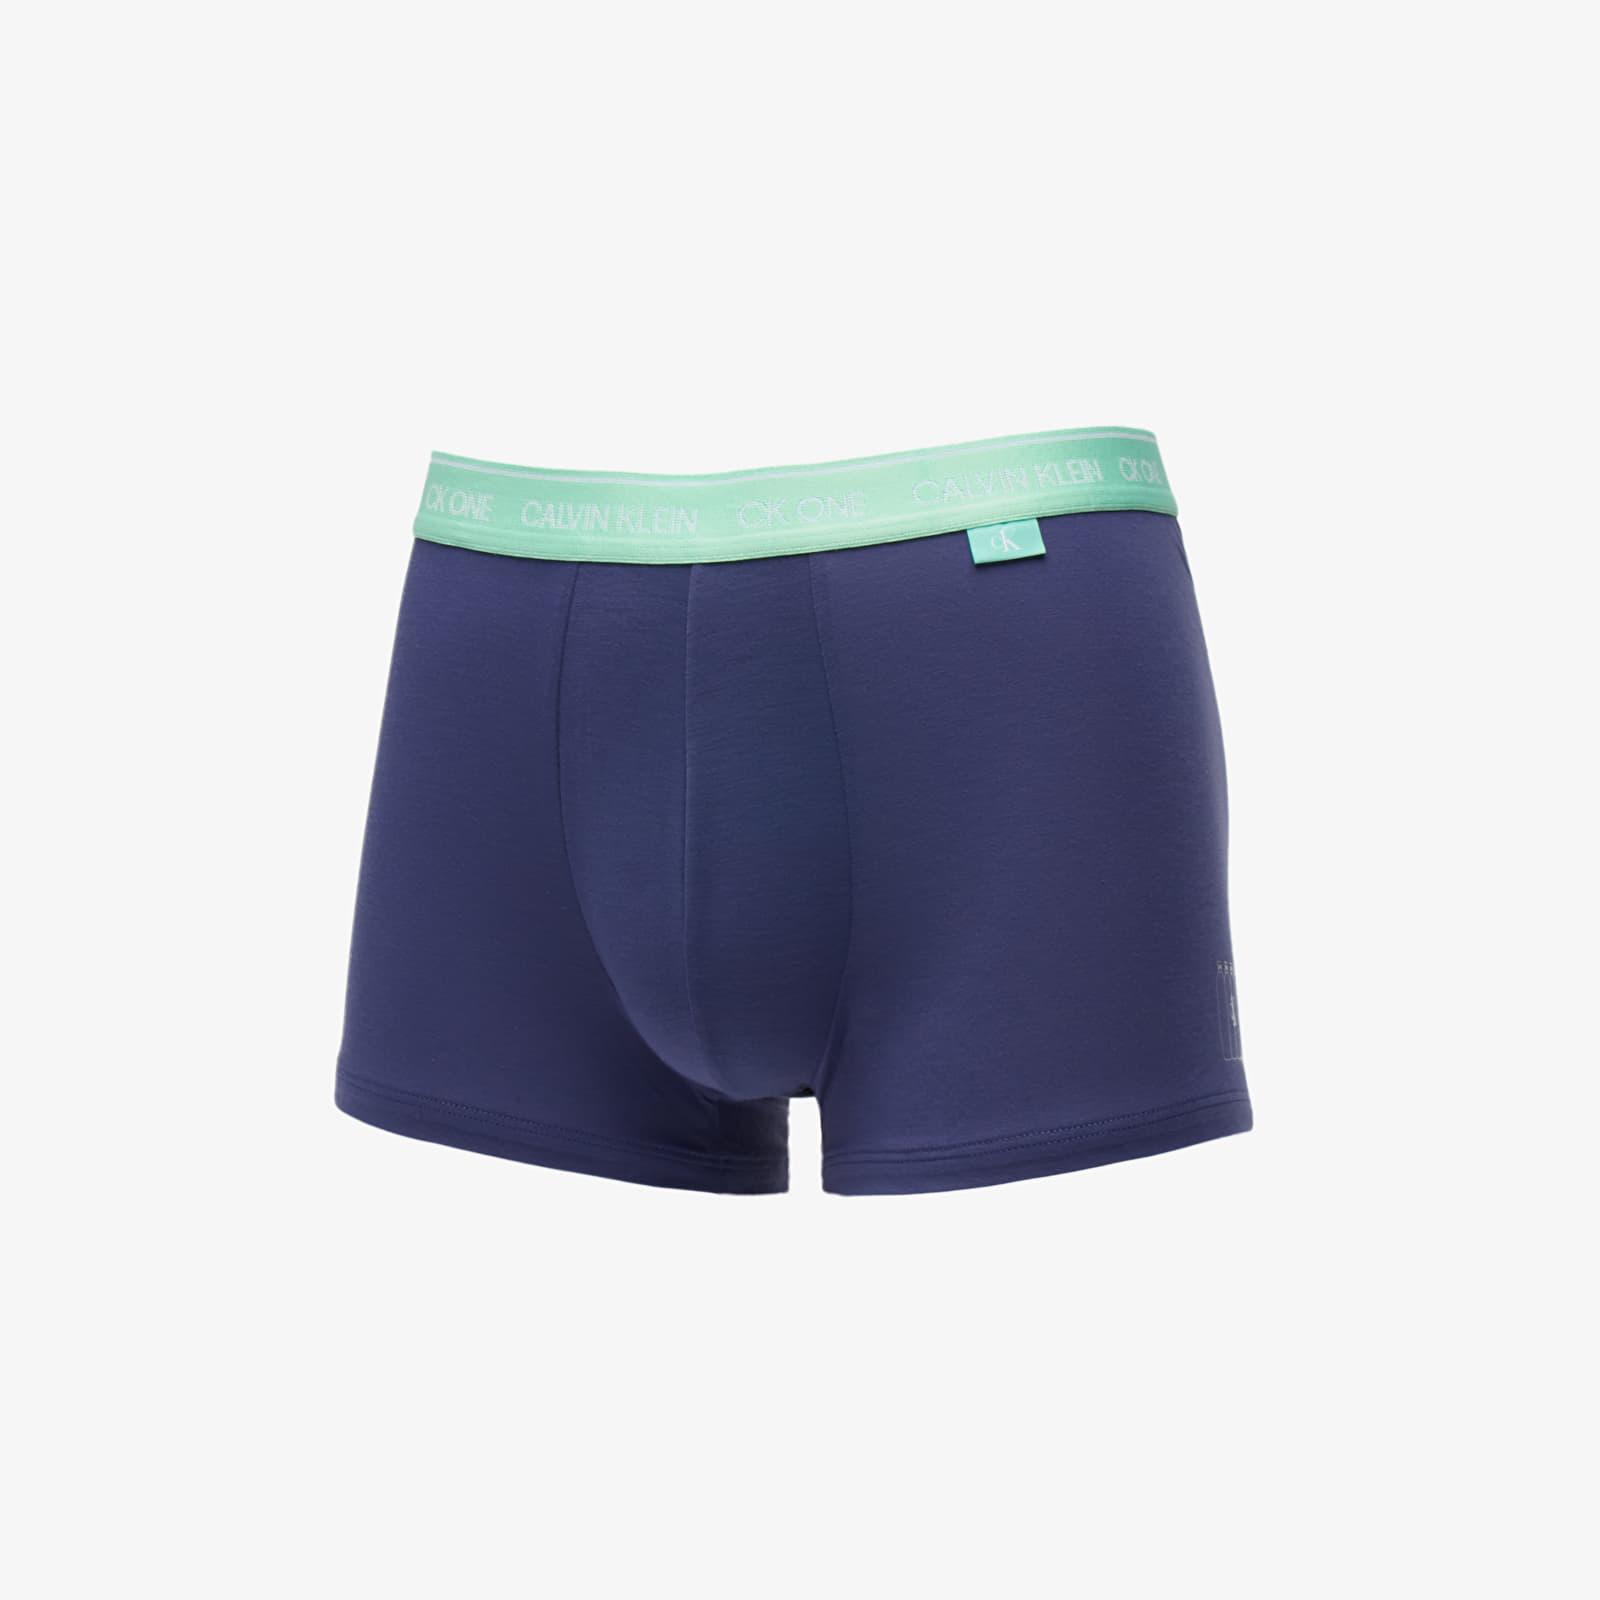 Boxer shorts Calvin Klein Trunks Blue Whale